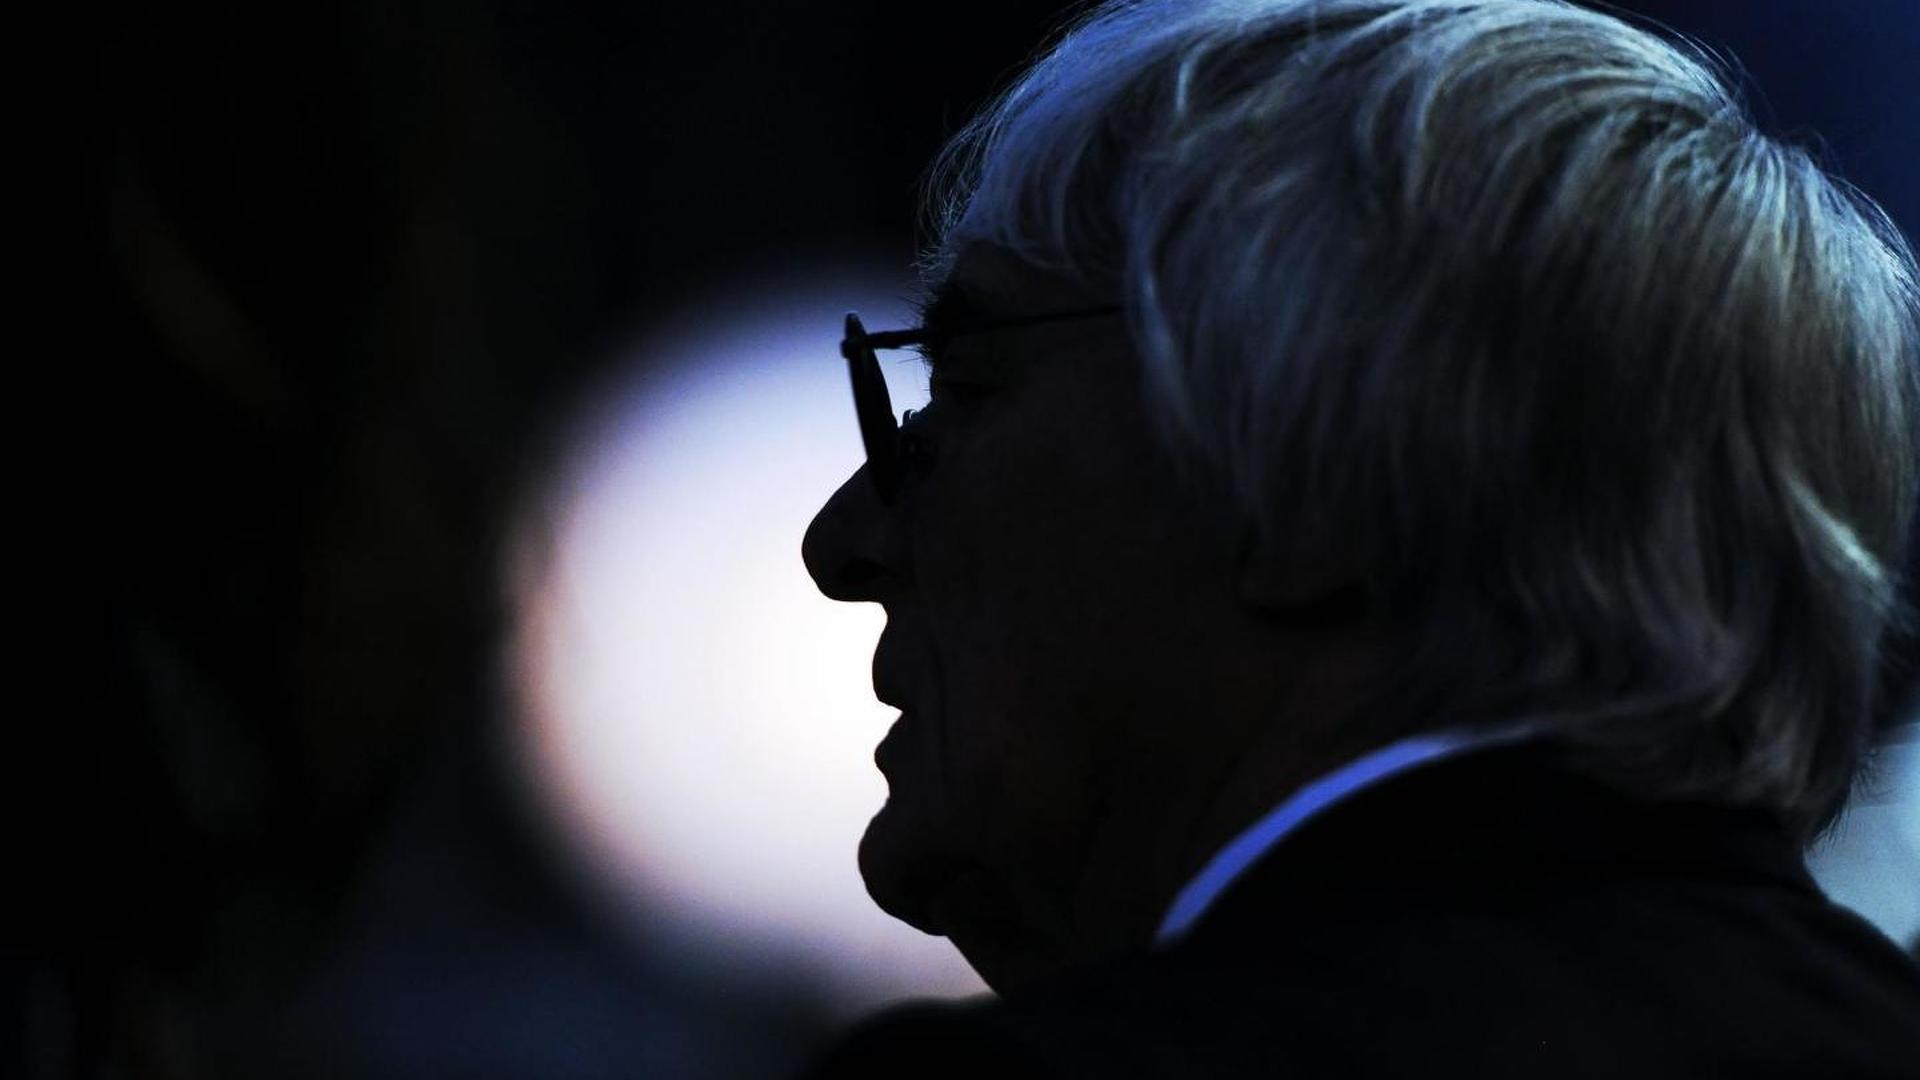 New F1 chairman to 'marginalise' Ecclestone - reports